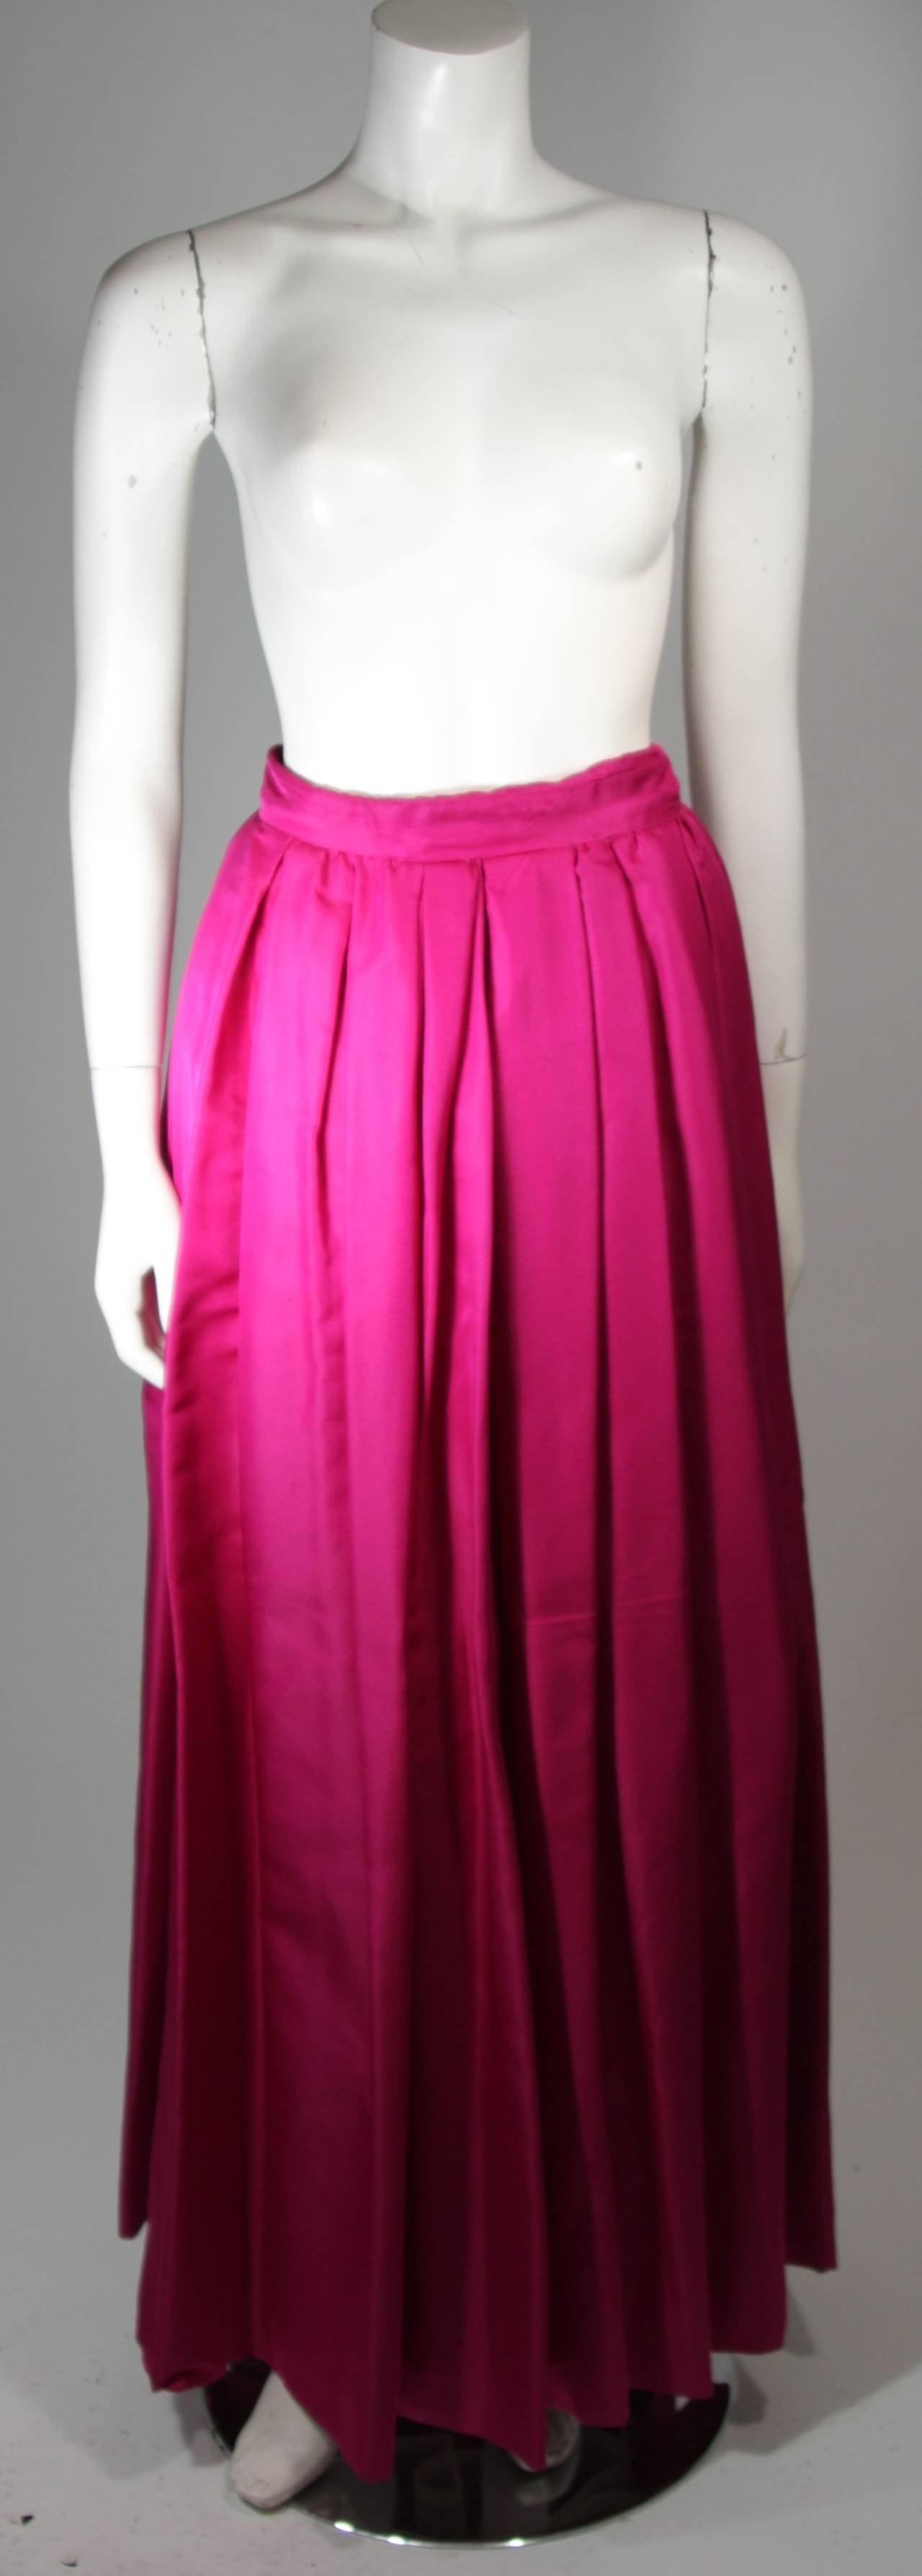 Bob Mackie Evening Skirt Set Ensemble in Purple Size Small 9